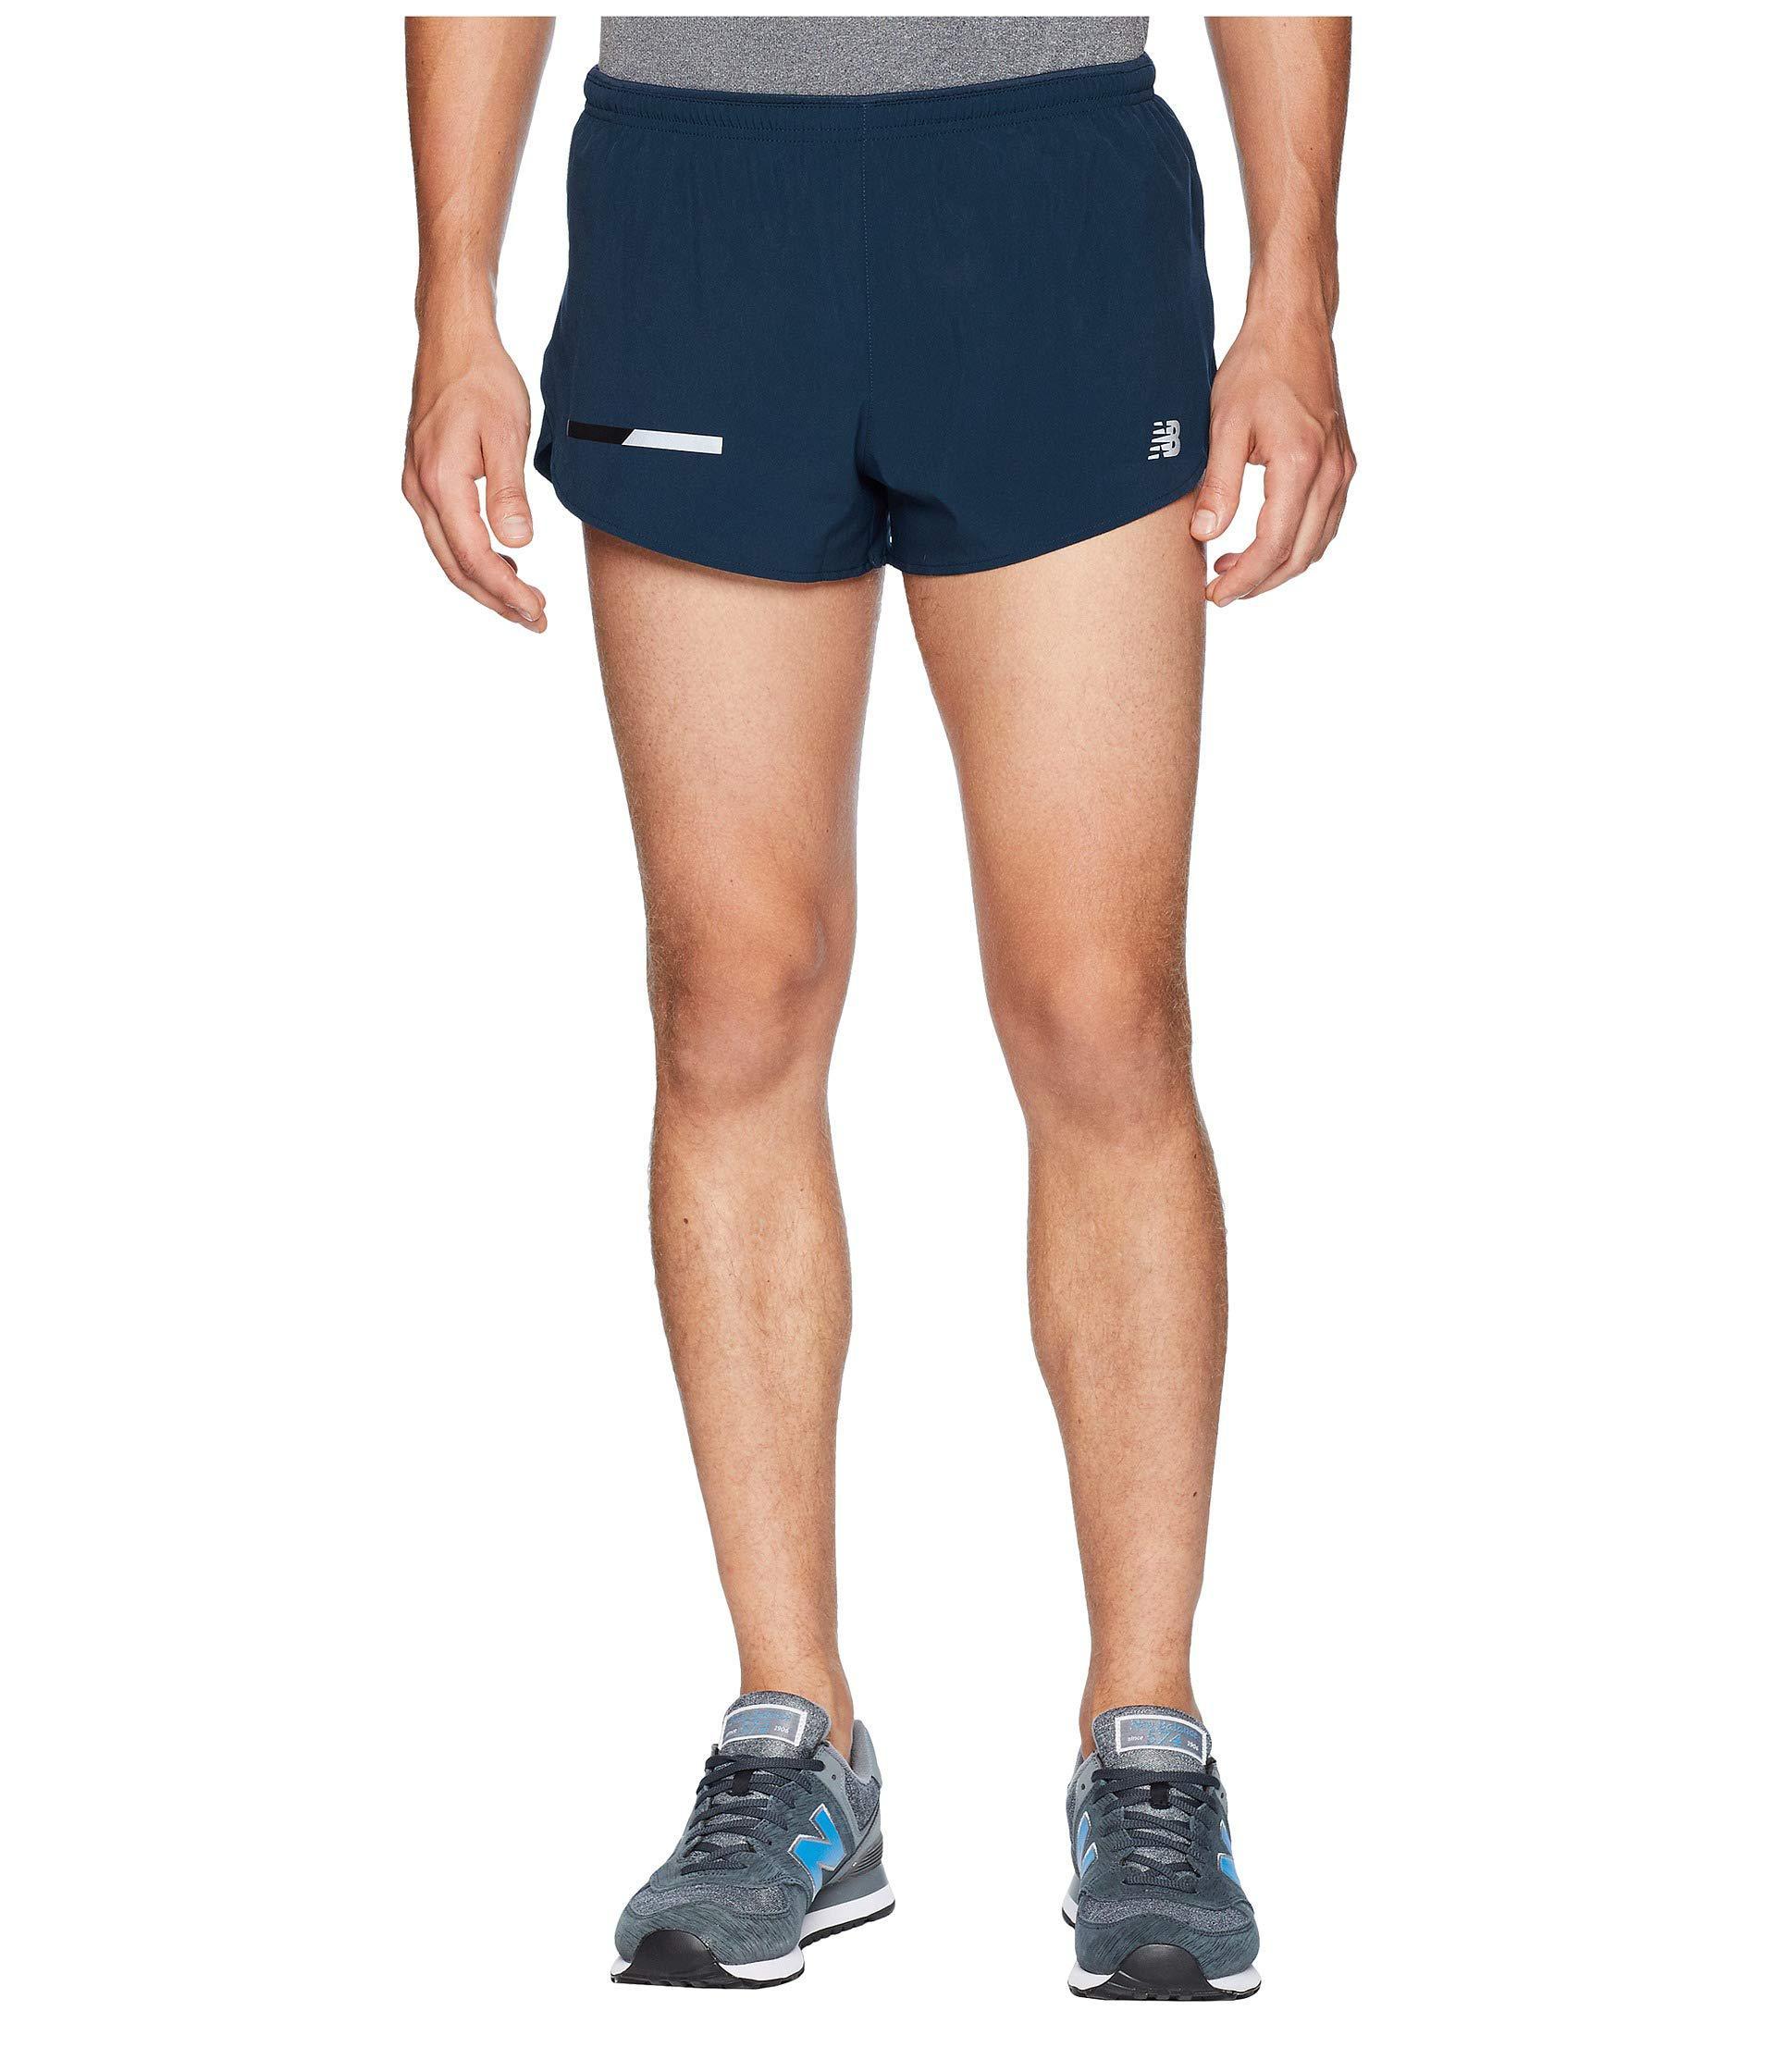 Lyst New Balance Impact Split Shorts 3 (flame) Men's